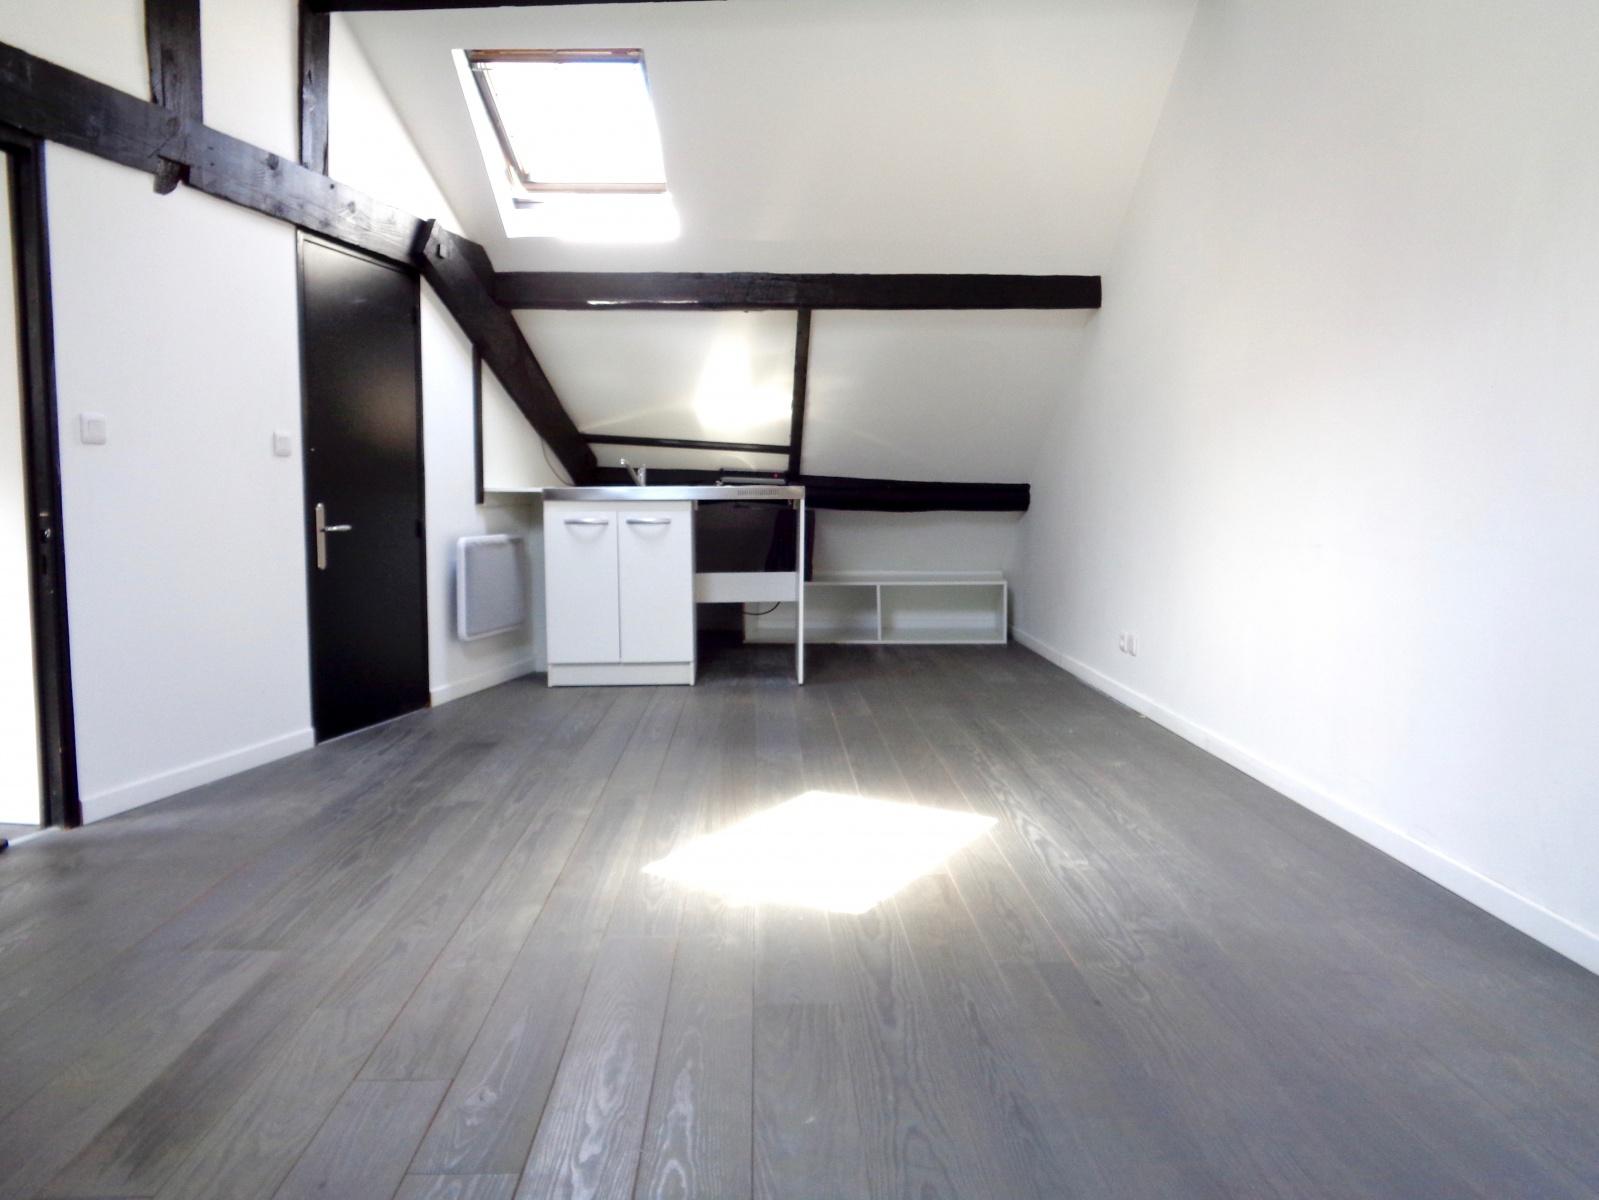 Studio - 33m2 - Montreuil